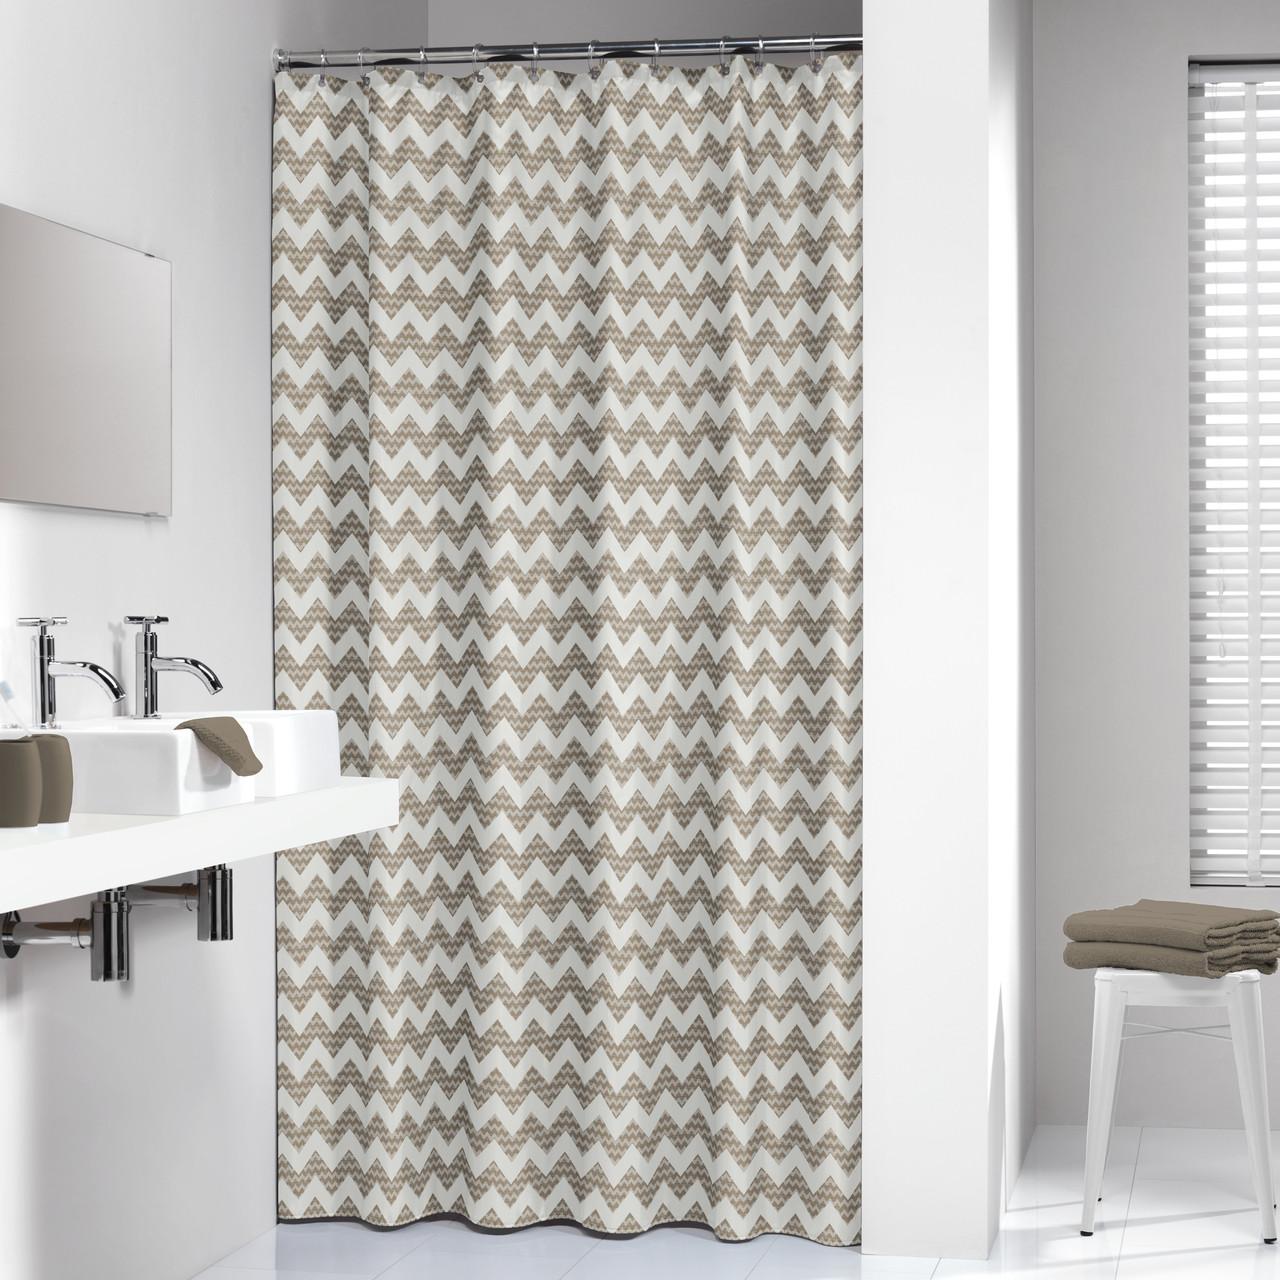 8717821455477 15100 Sealskin Na Bathroomaccessories Shower Curtain MOTIF Original JPG 987161503164221c2imbypasson